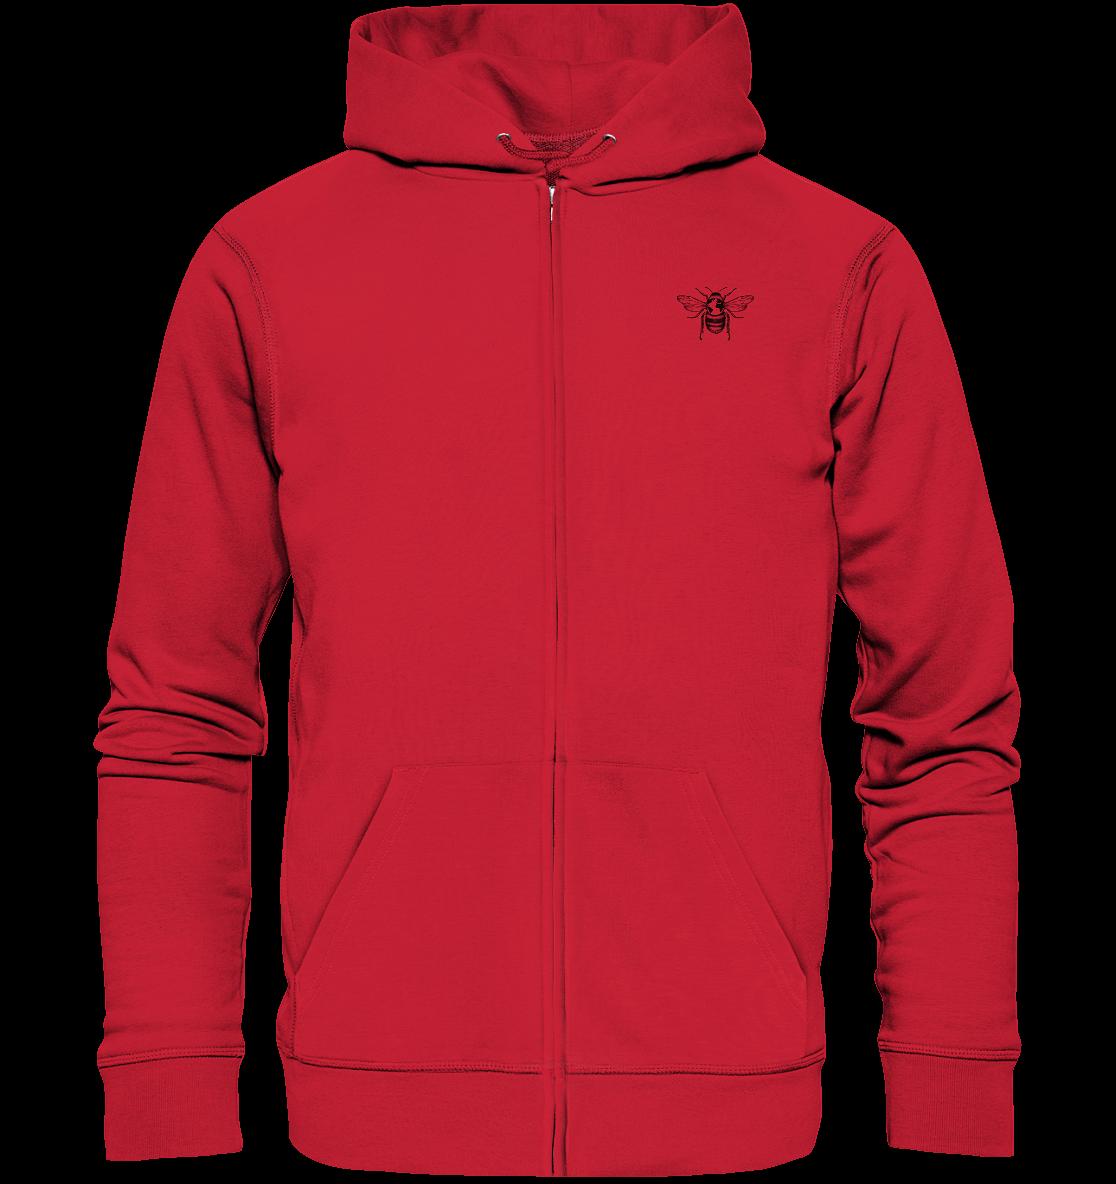 front-organic-zipper-cb1f34-1116x.png